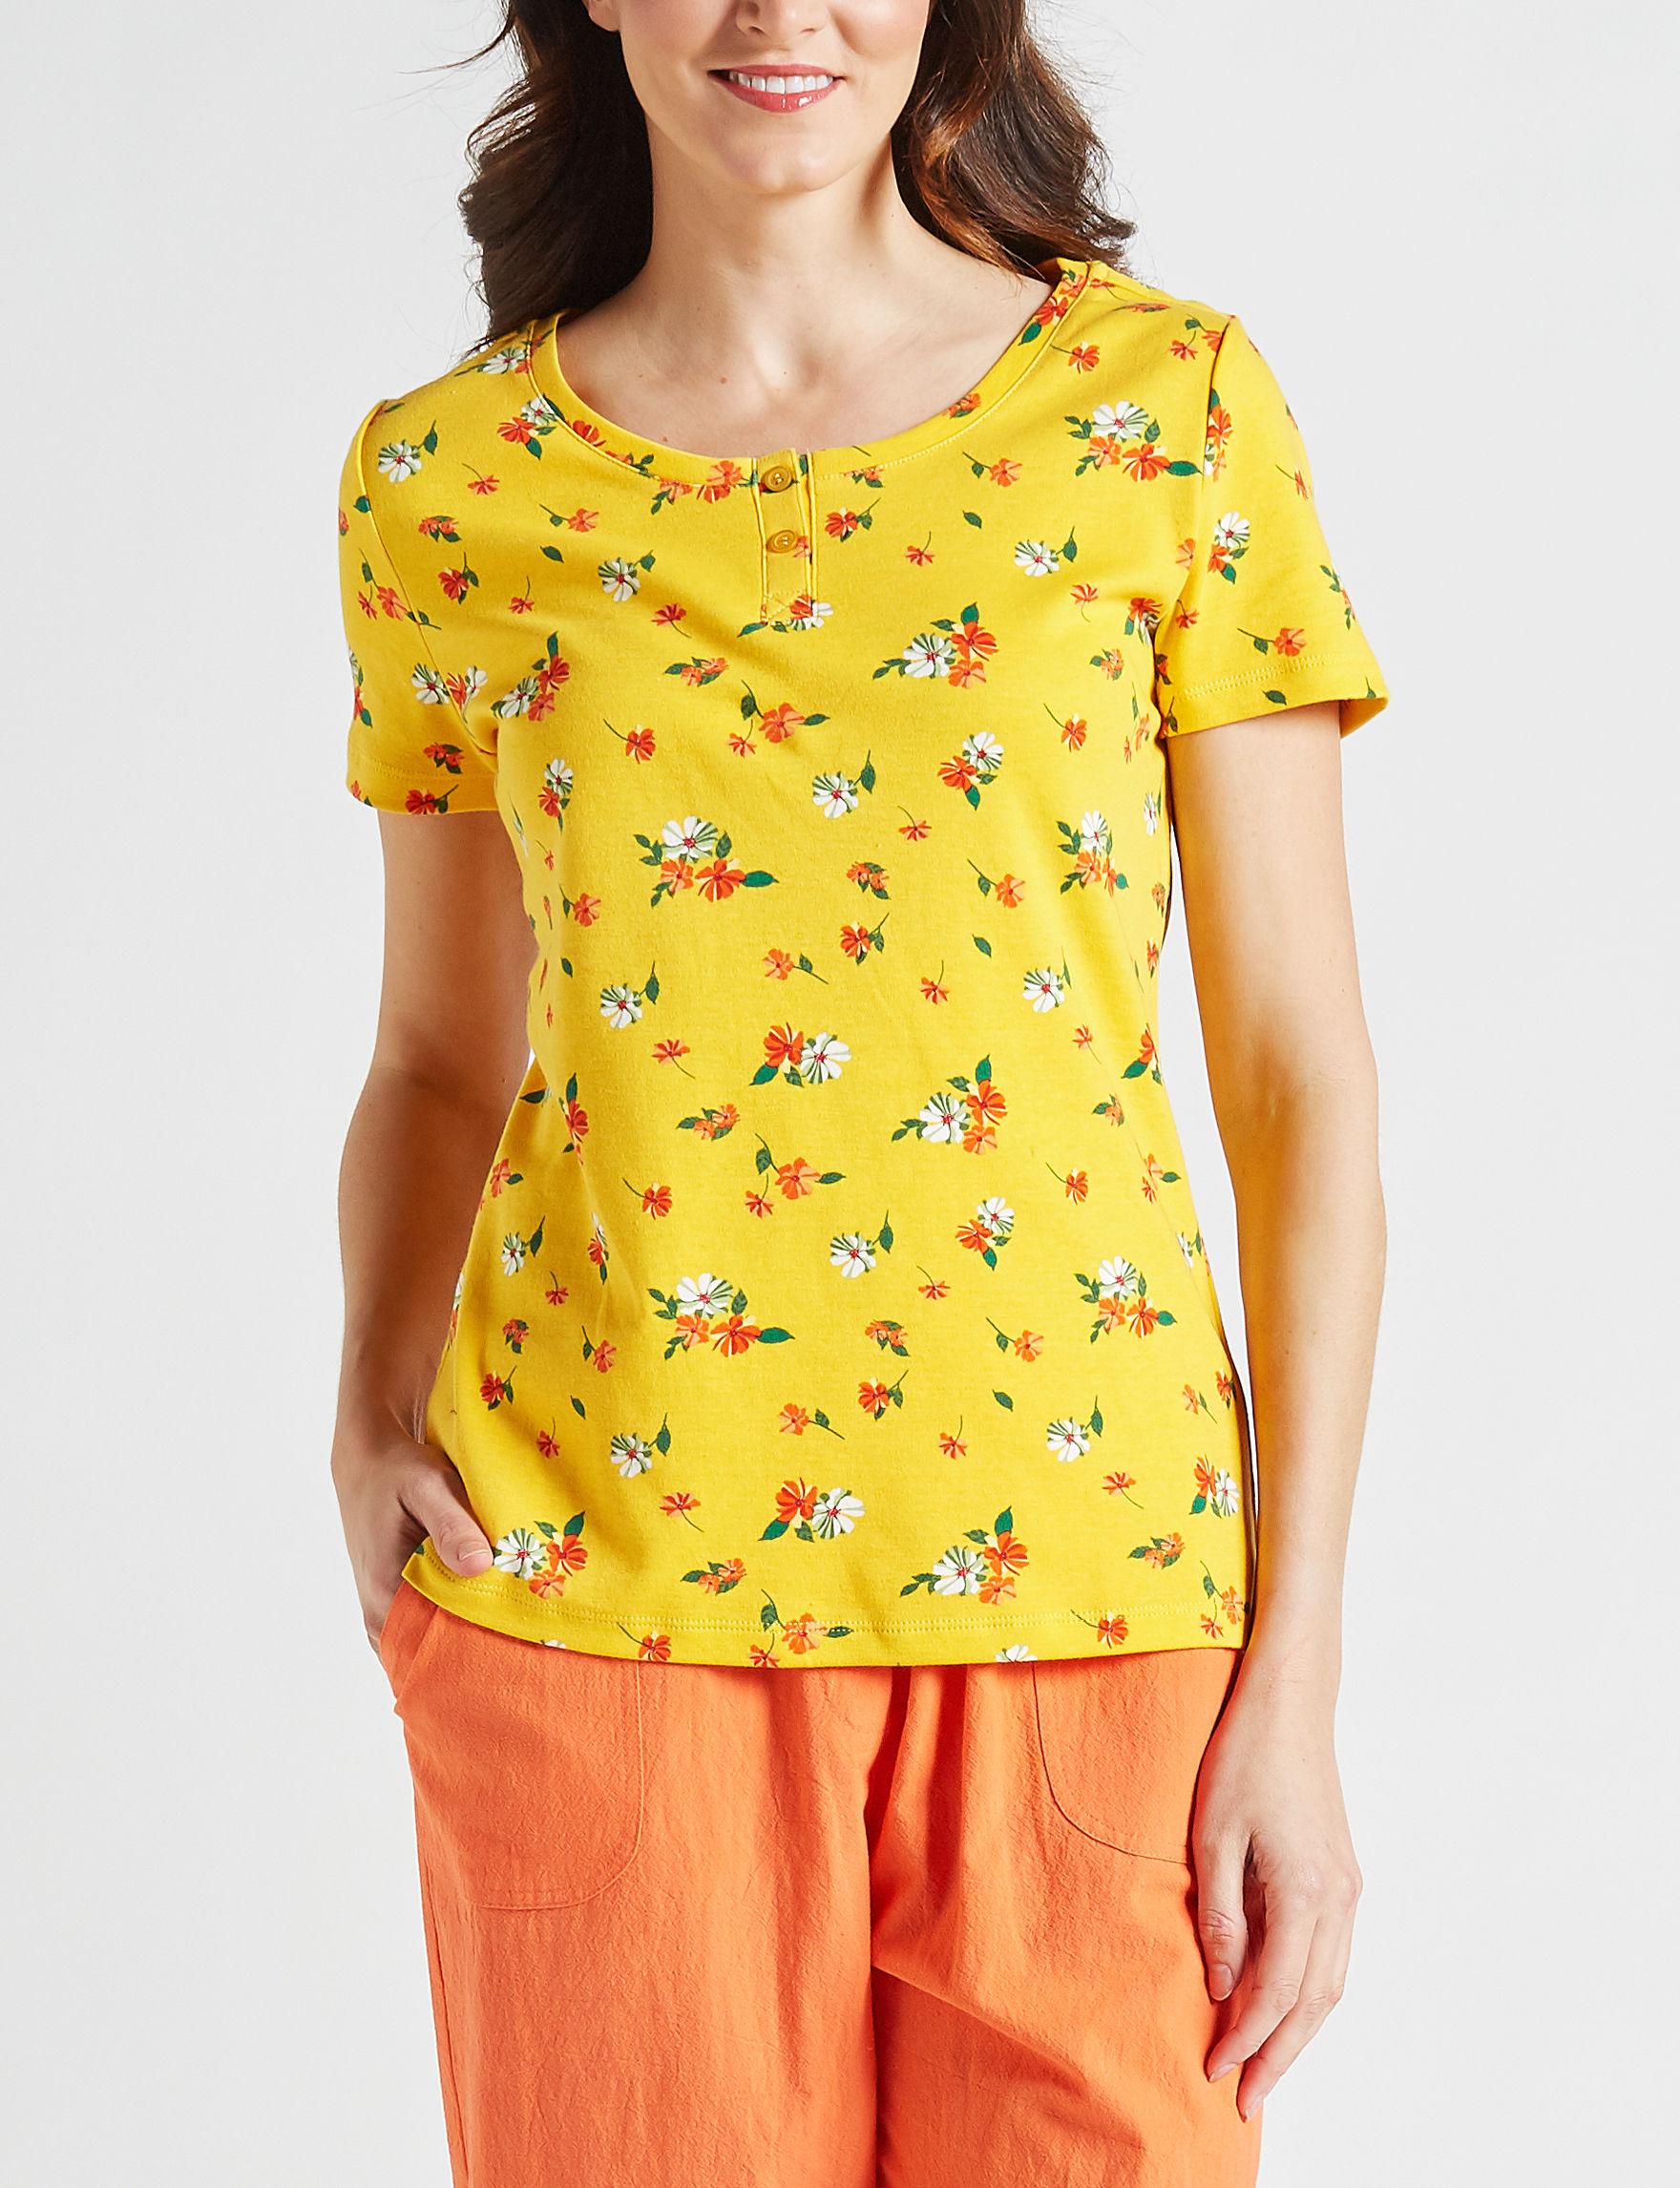 Rebecca Malone Yellow Floral Shirts & Blouses